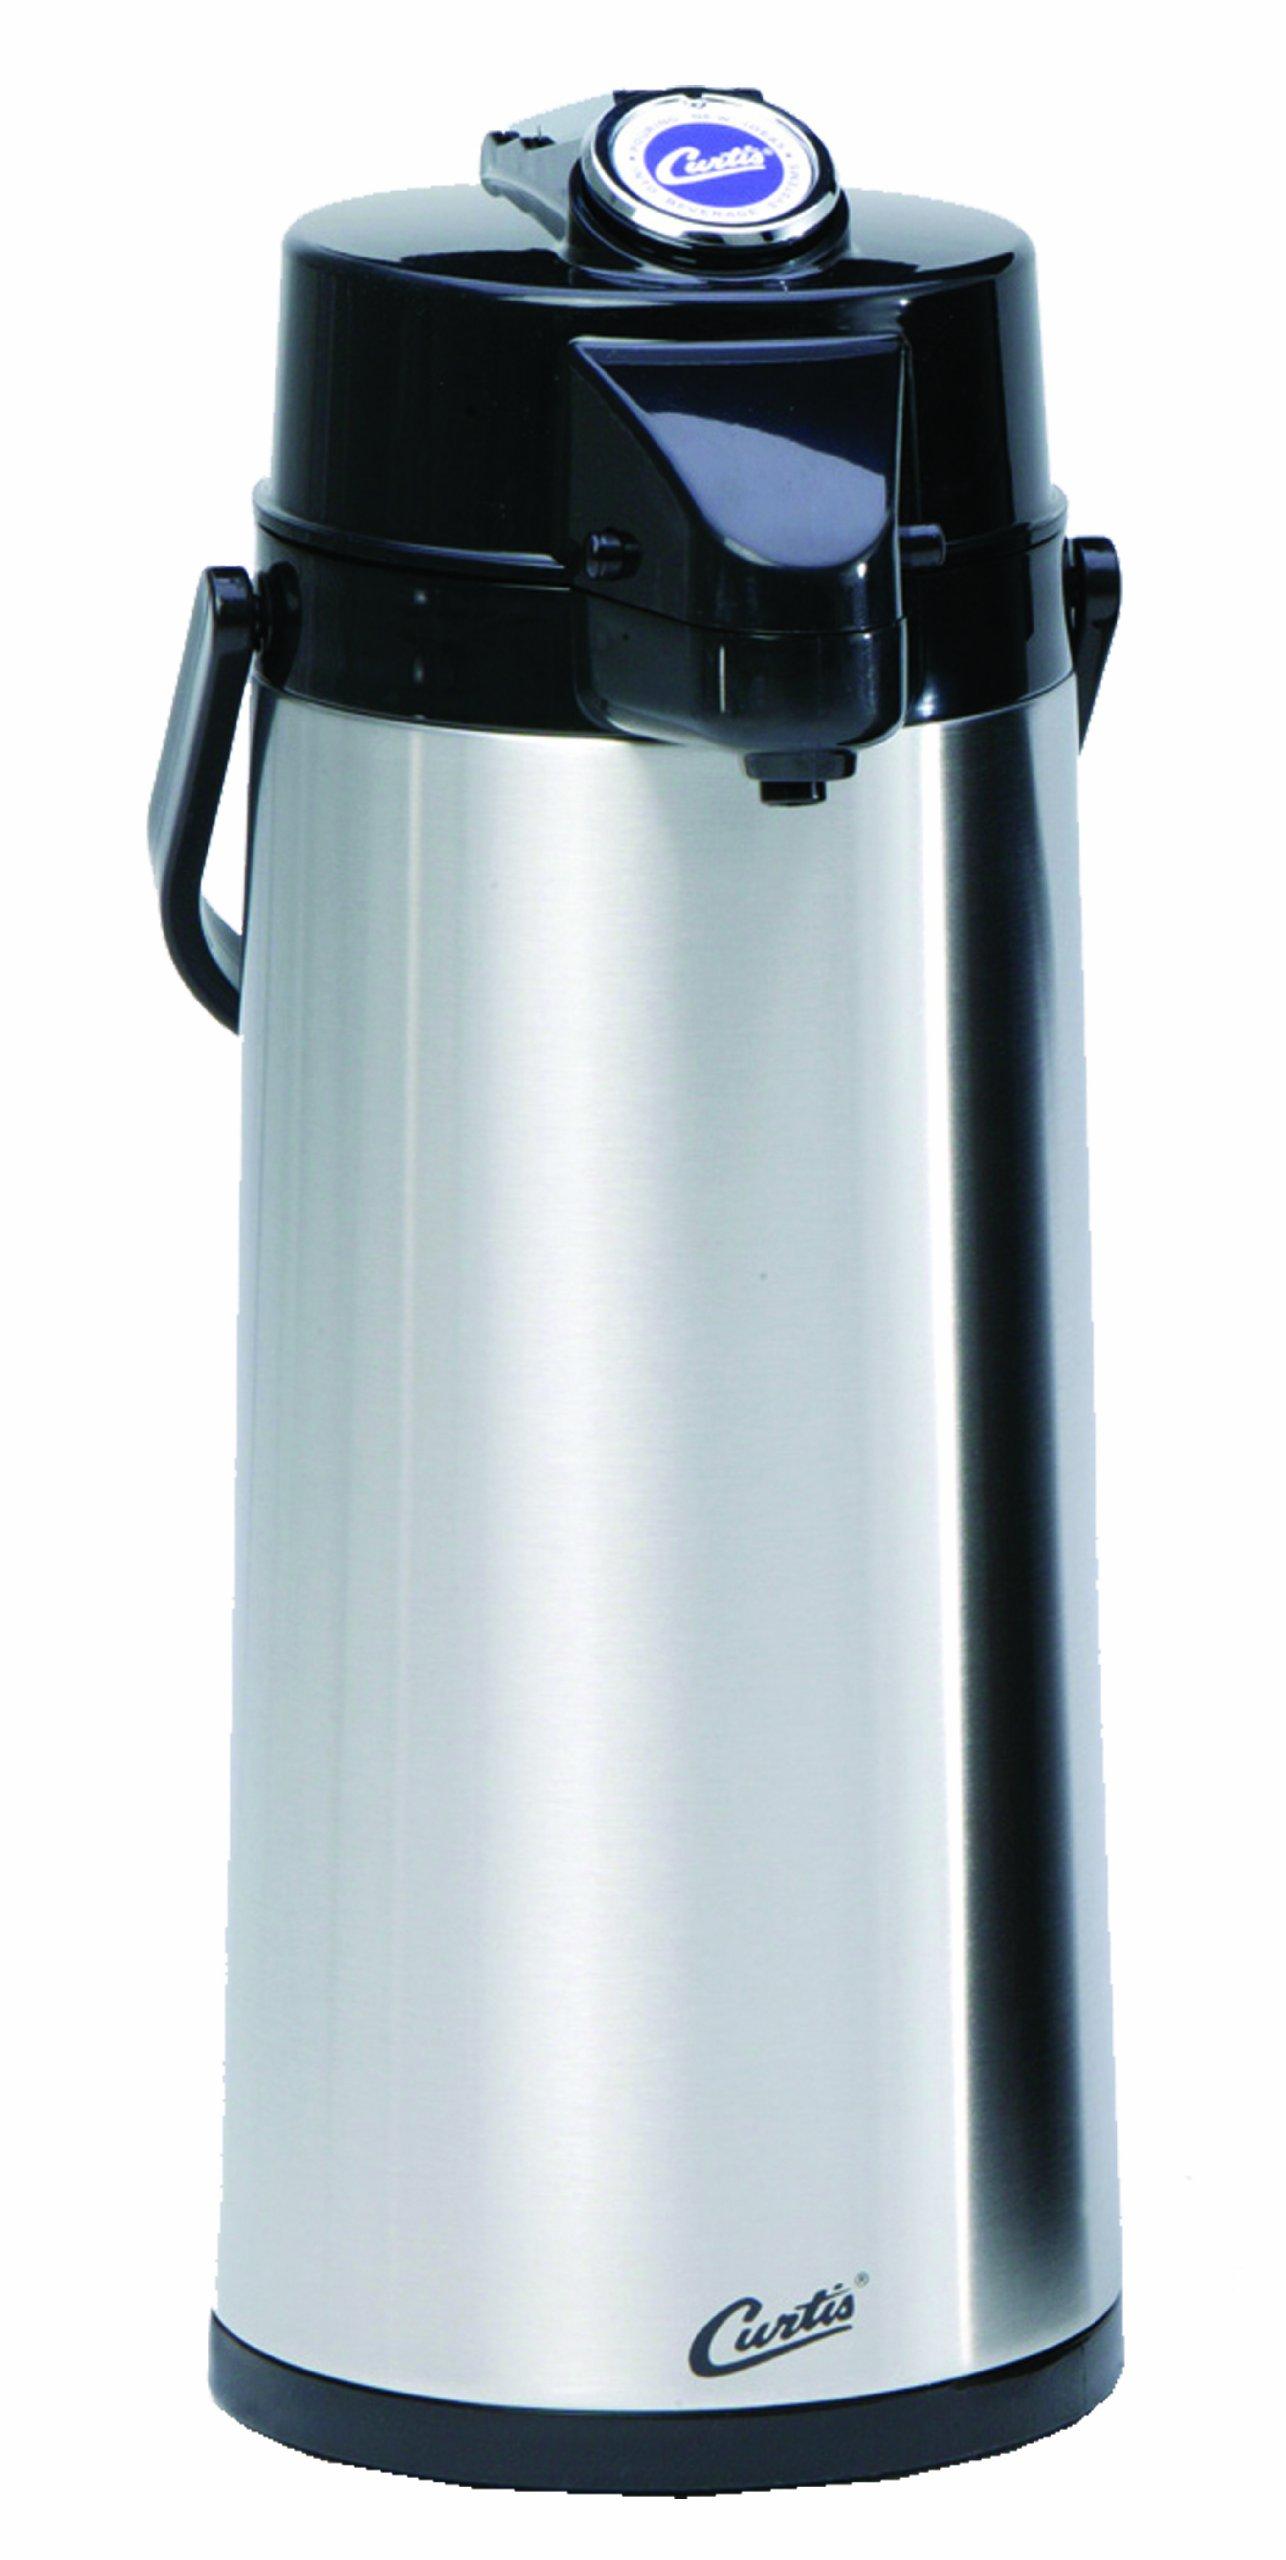 Wilbur Curtis Thermal Dispenser Air Pot, 2.2L S.S. Body Glass Liner Lever Pump - Commercial Airpot Pourpot Beverage Dispenser - TLXA2201G000 (Each)